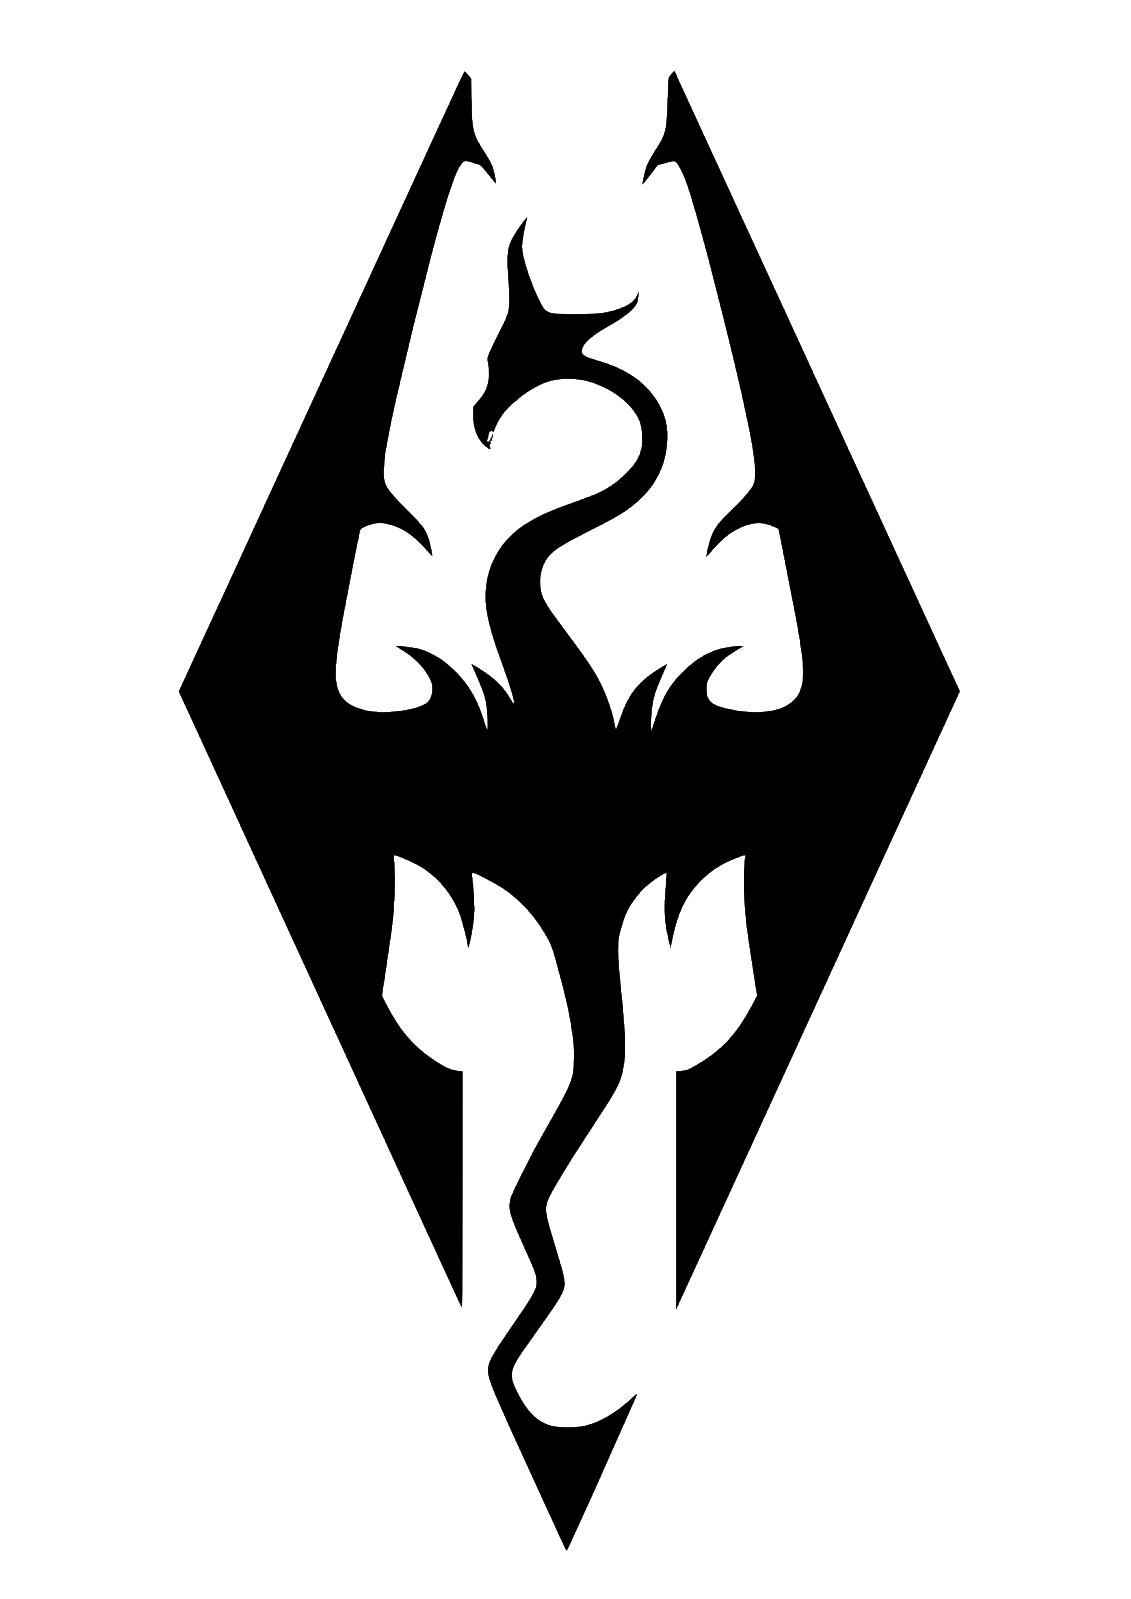 Transfer Gaming Elder Scroll Graphic Wall Art Decal Sticker Skyrim